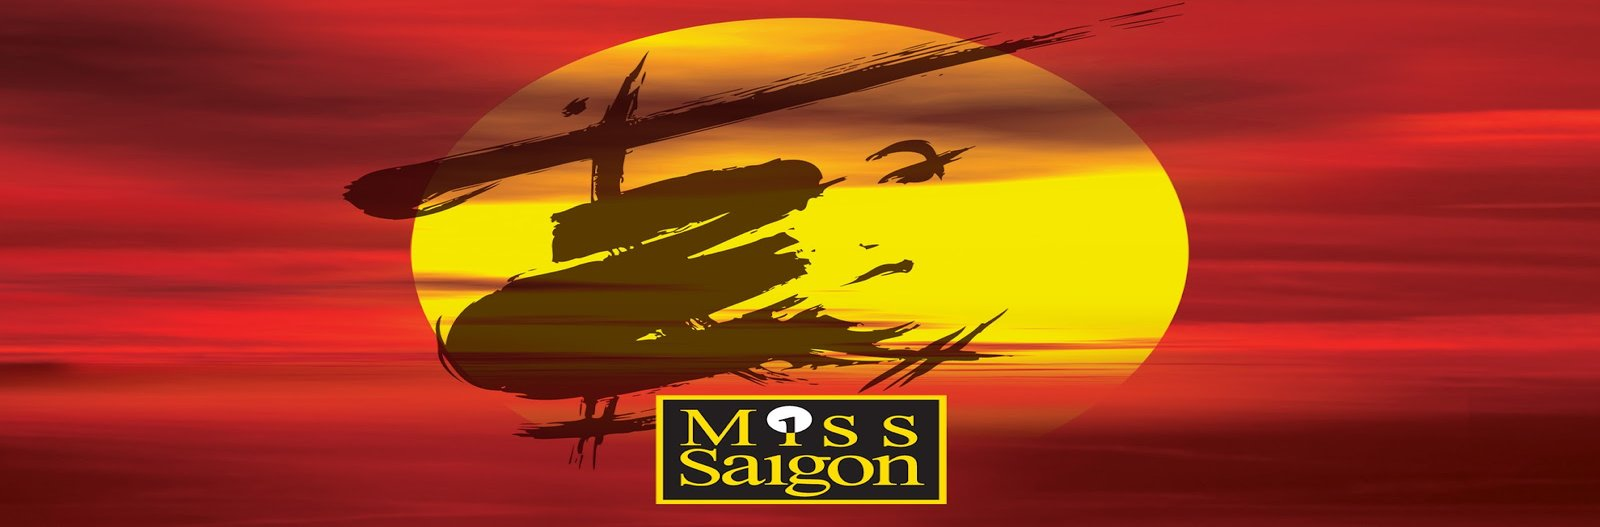 rsz_miss_saigon